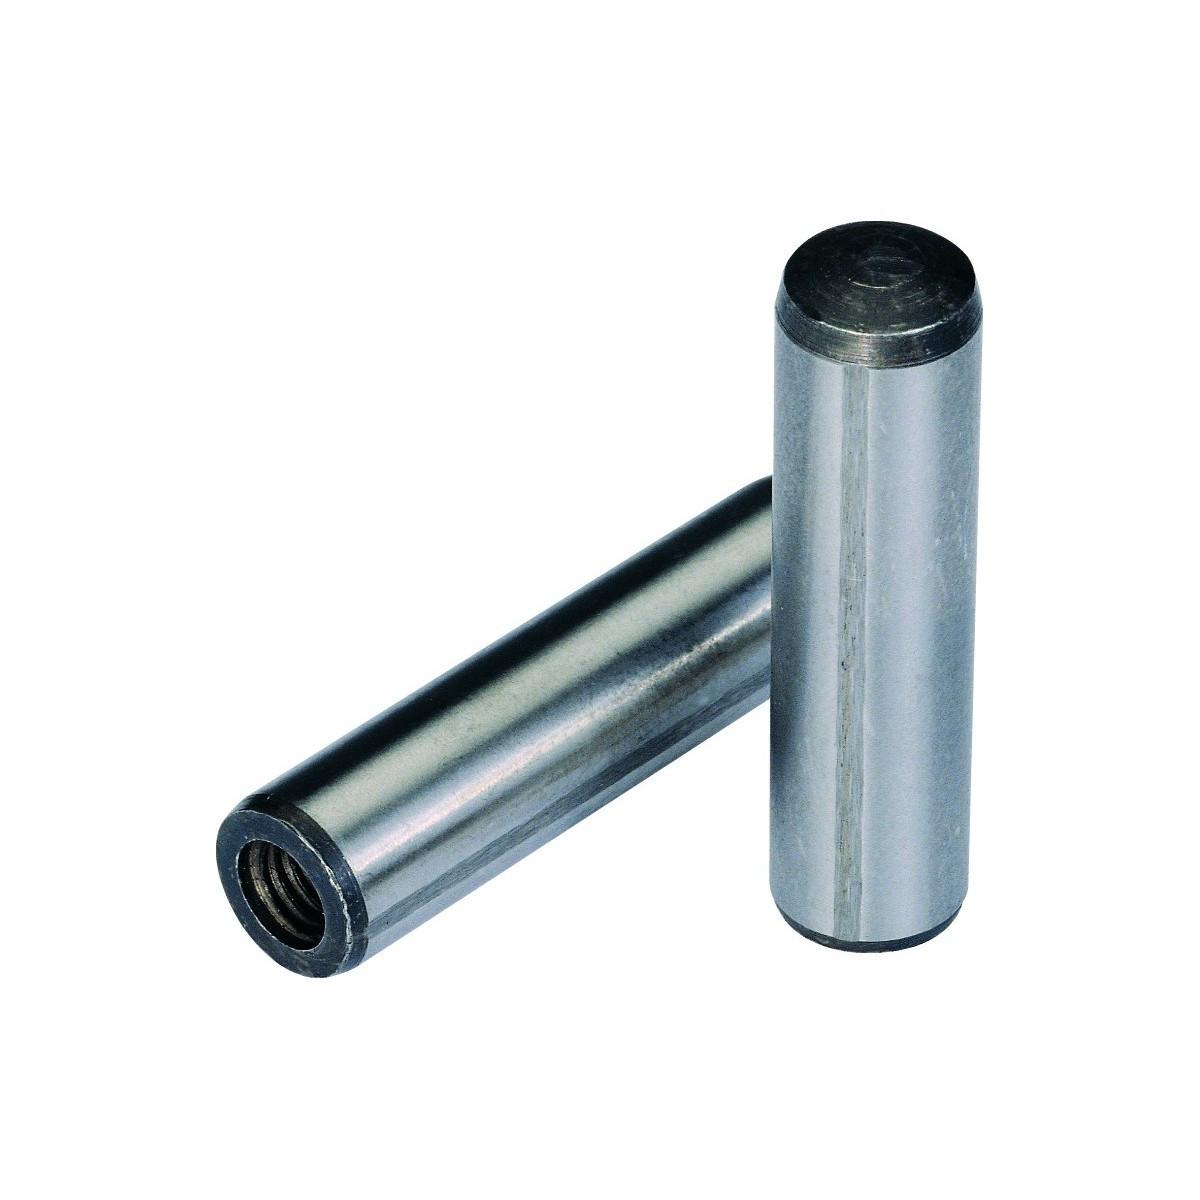 Штифт цилиндрический MMG  DIN 7979D M20 х 50 Класс 10.9 (Фосфат) 1 шт